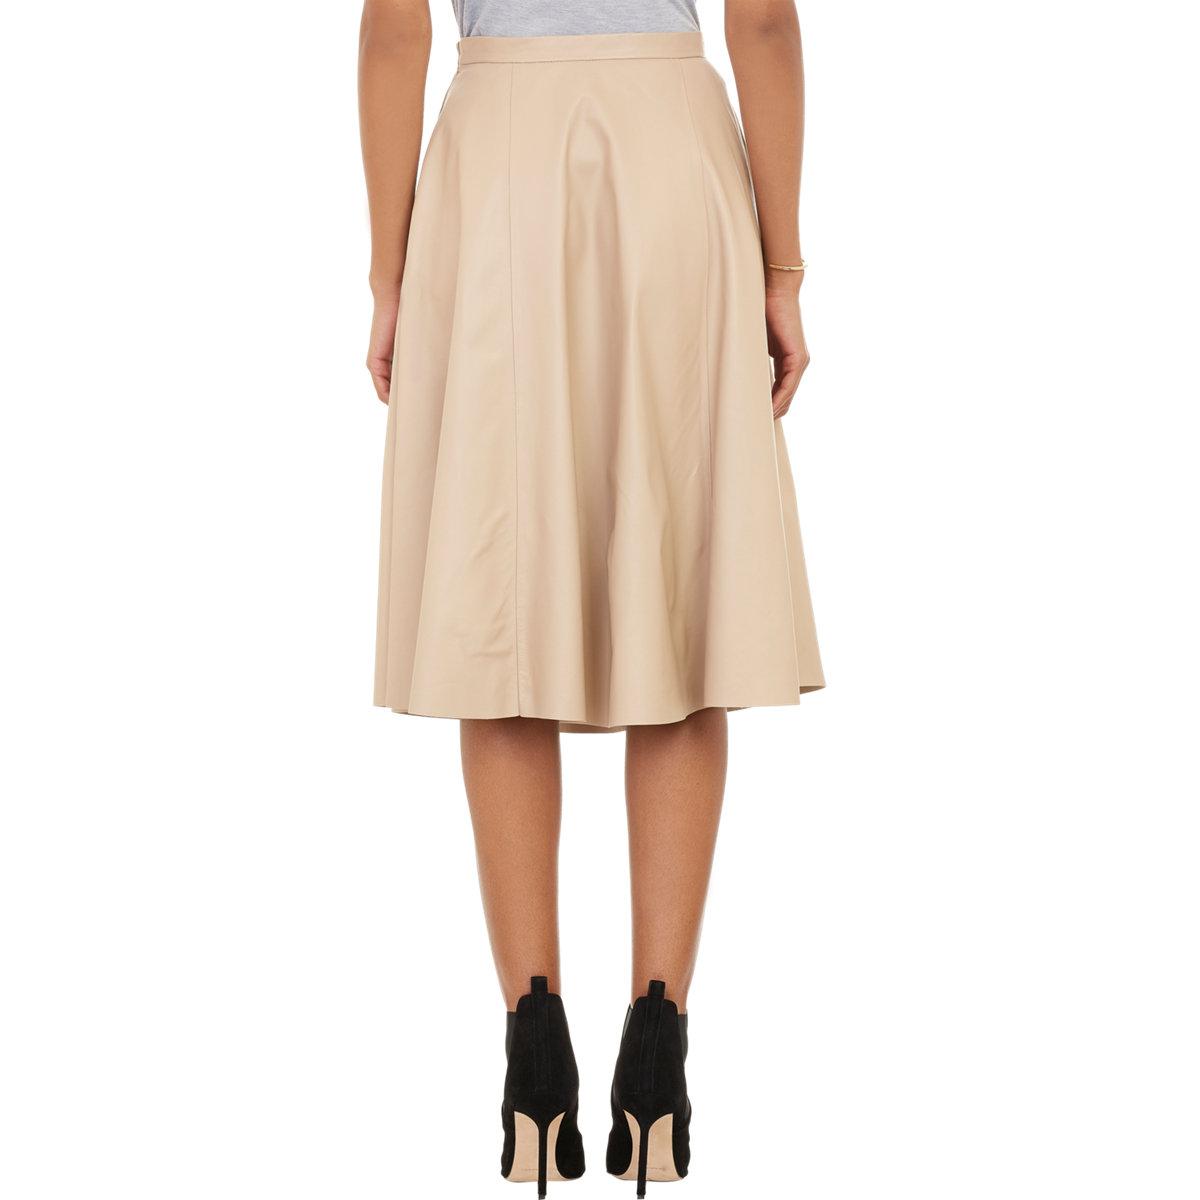 barneys new york x yasmin sewell leather circle skirt in